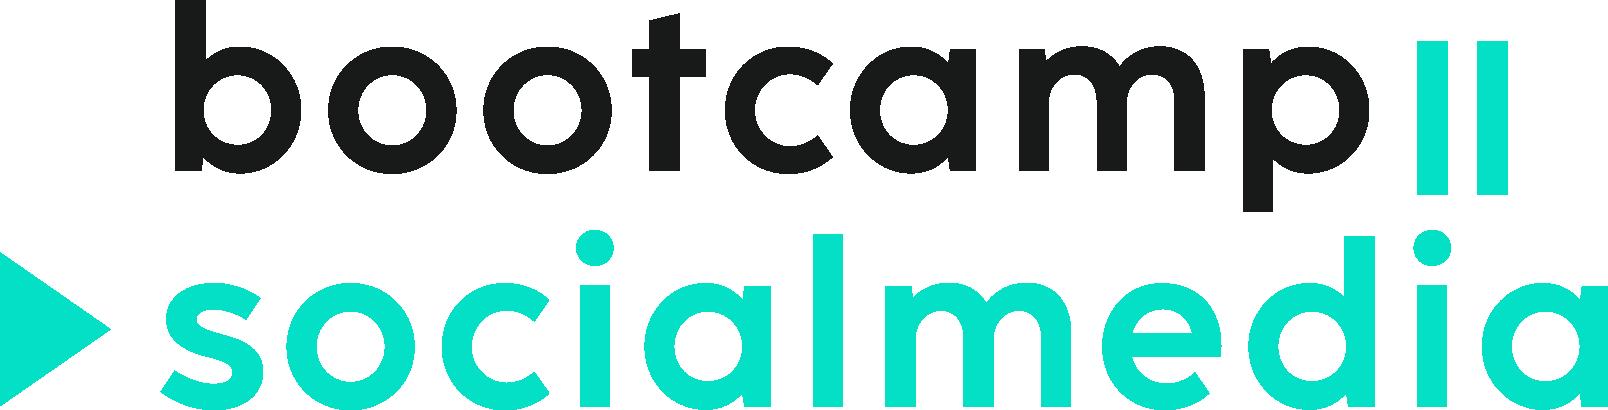 Bootcamp-for-music-brand-socialmedia